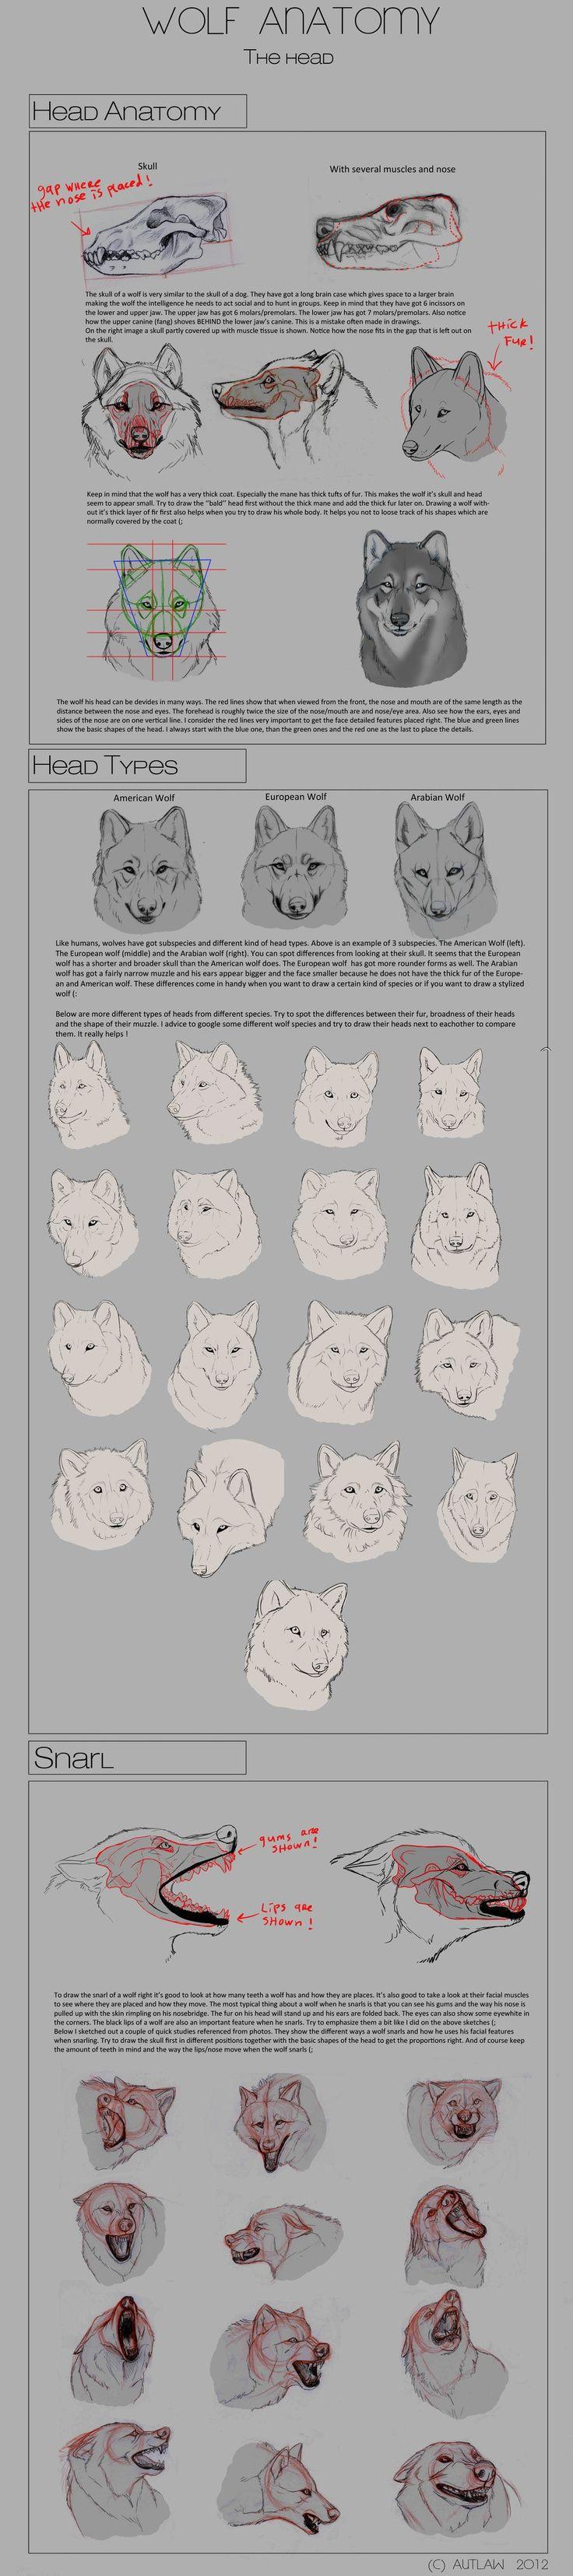 best animal illustration images on pinterest